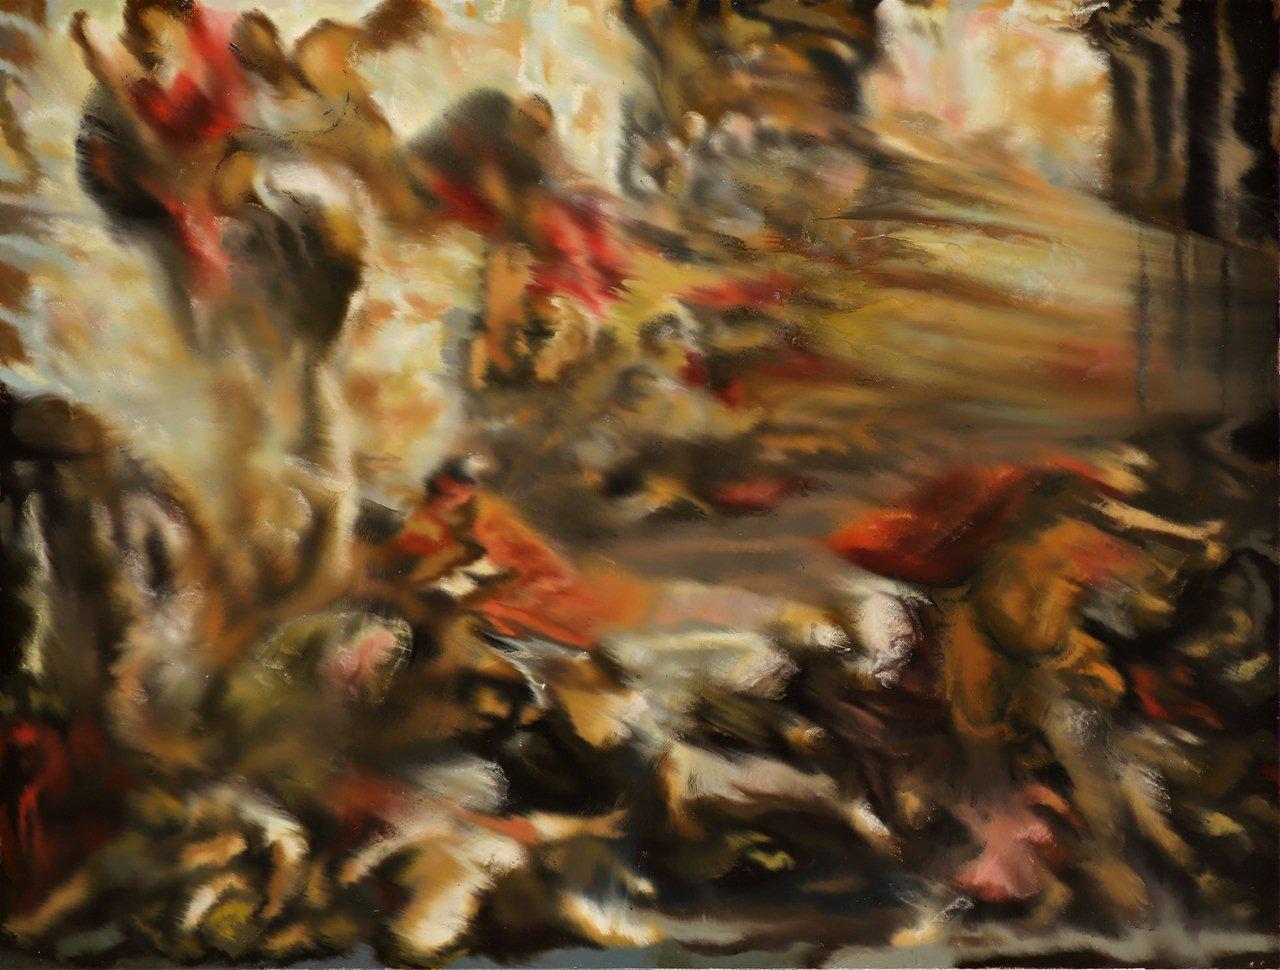 Jorge Pombo omaggia Tintoretto